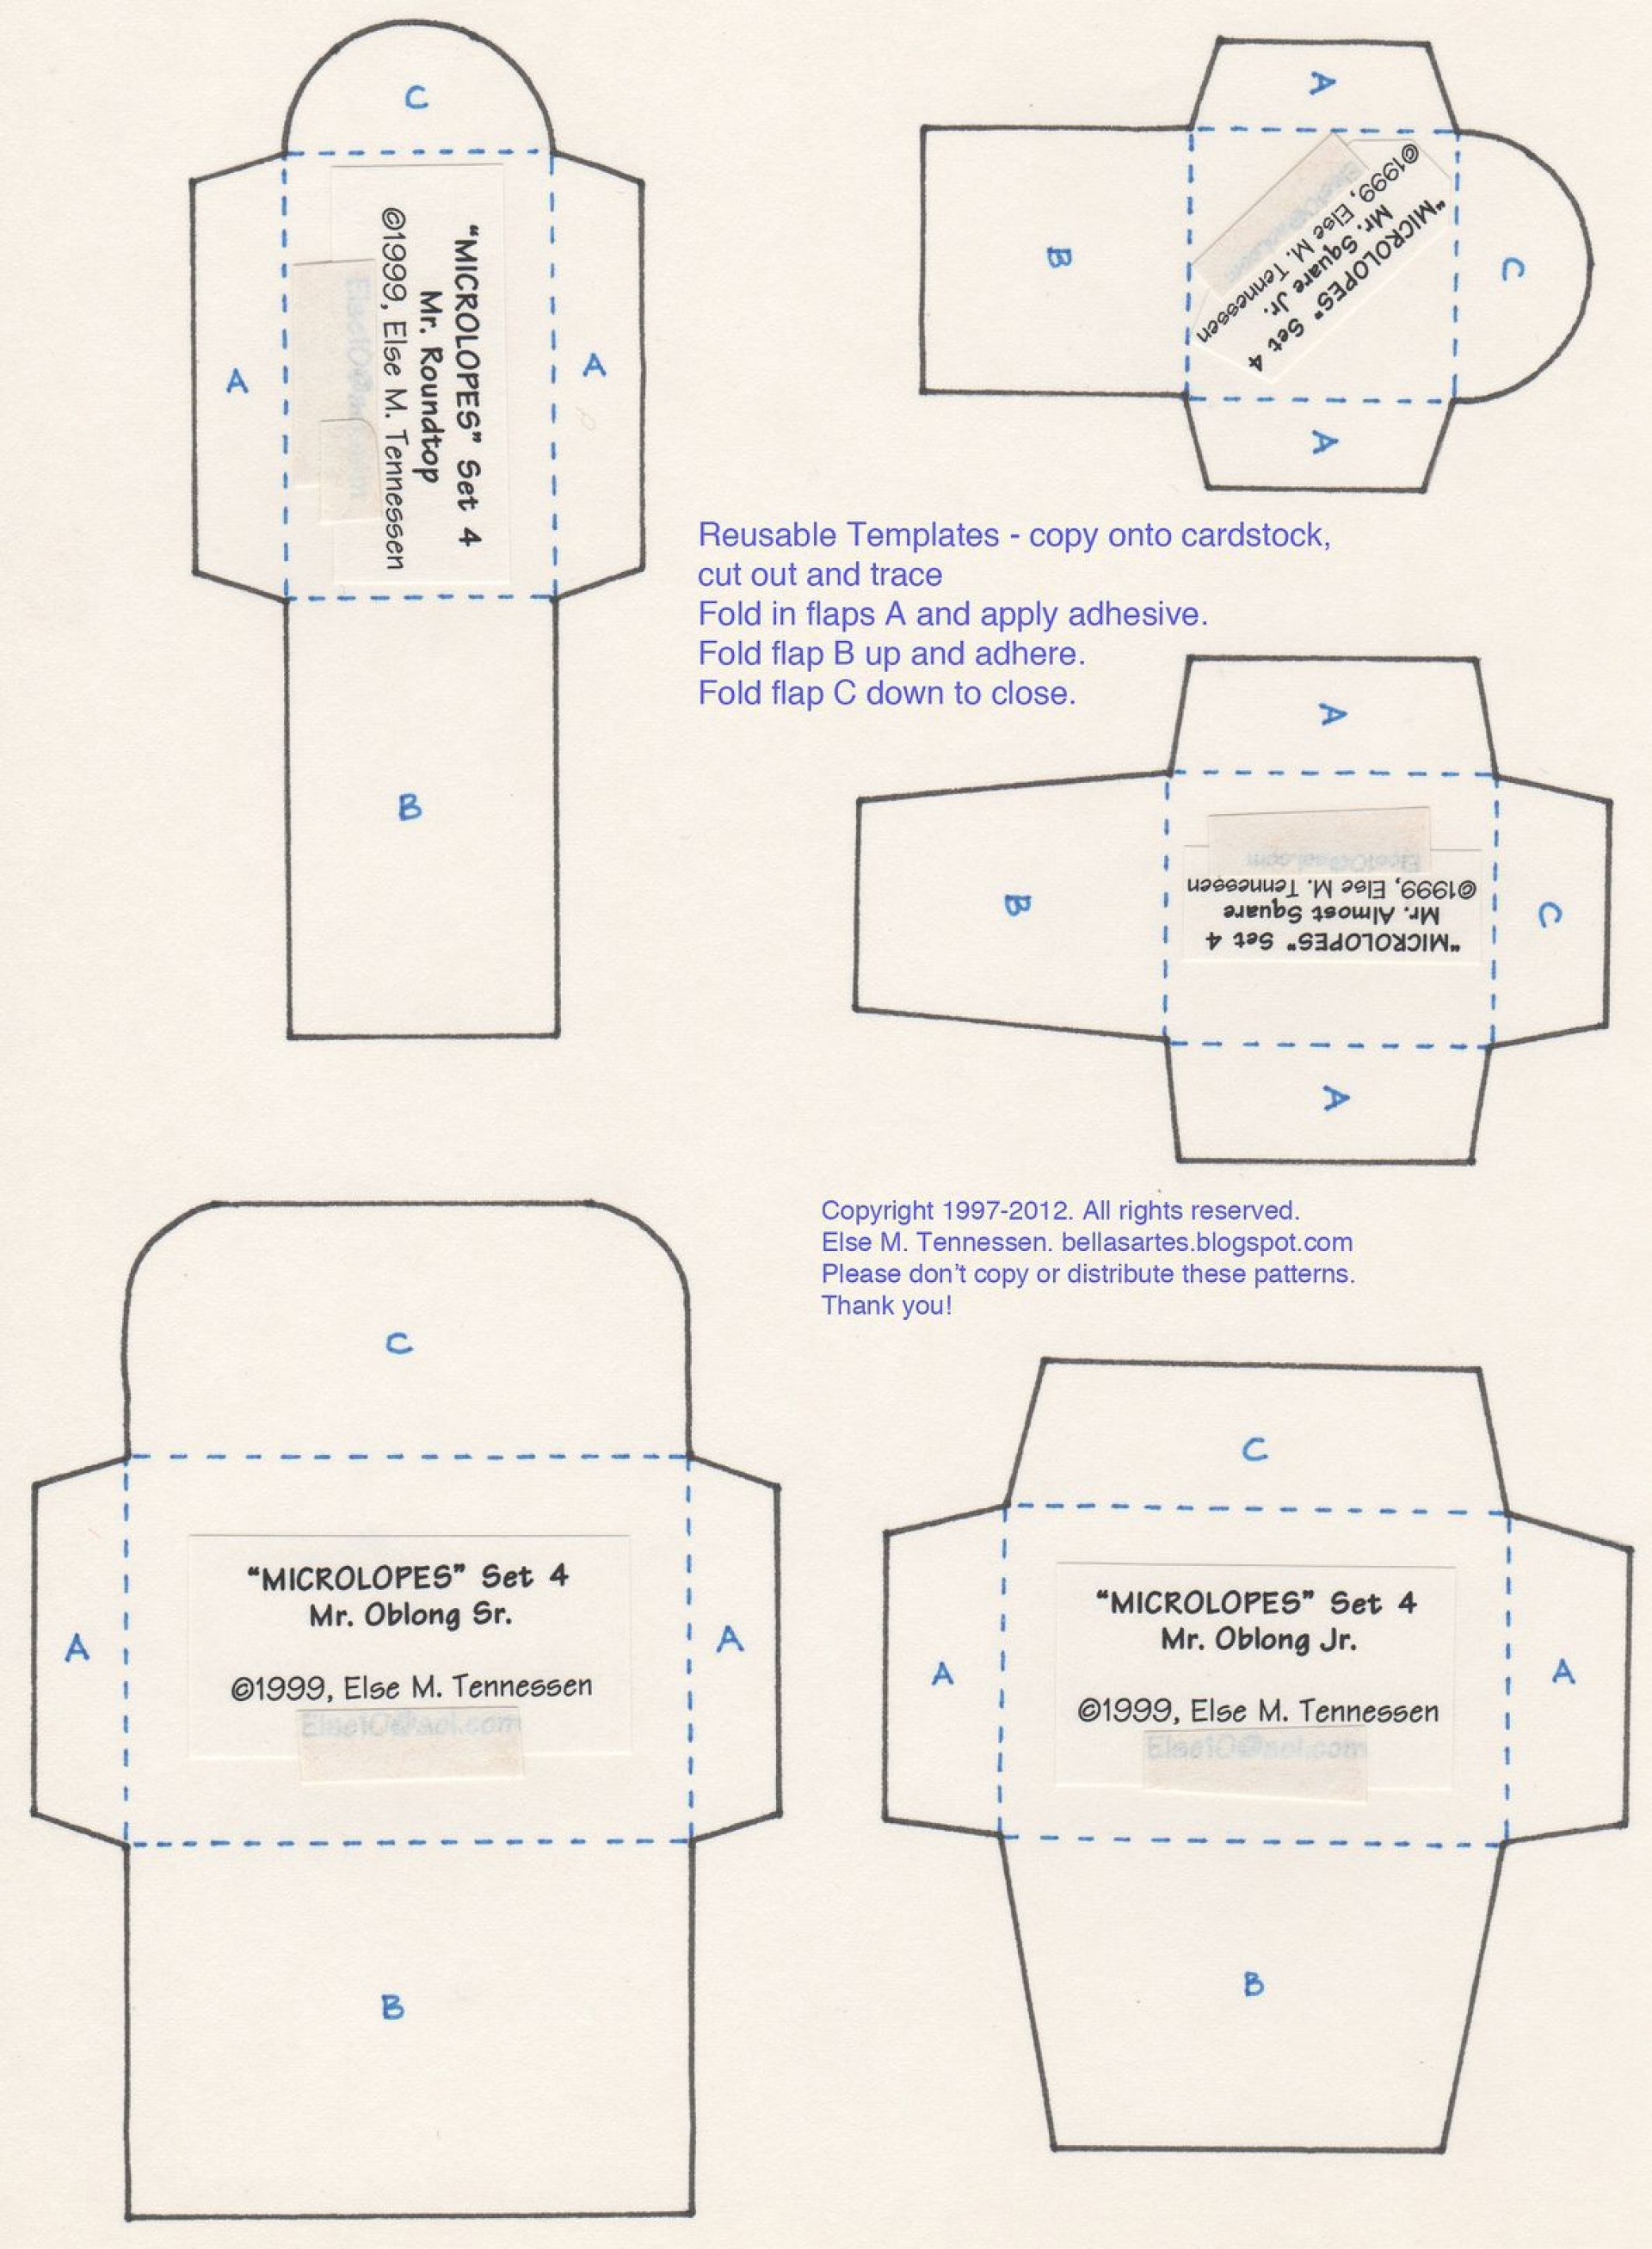 000 Sensational Gift Card Envelope Template Concept  Templates Voucher Diy Free Printable1920